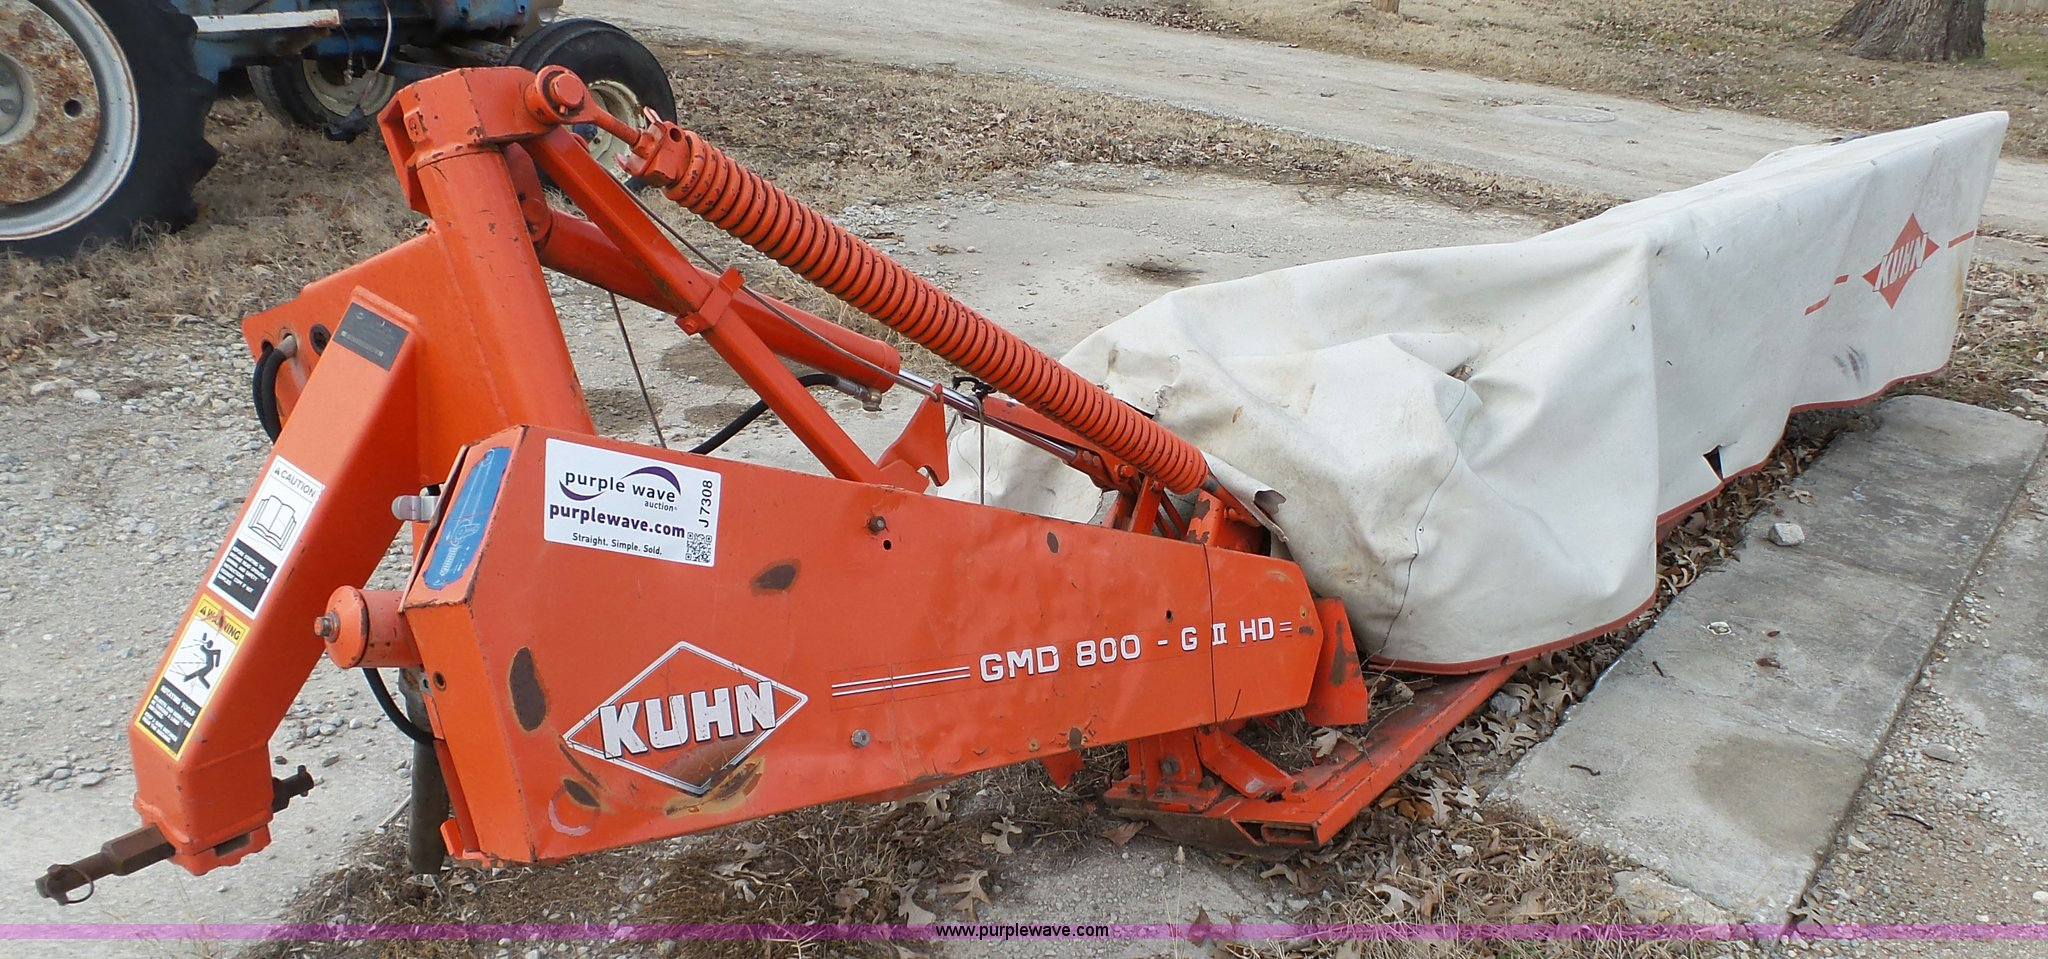 ... Kuhn disc mower Full size in new window ...